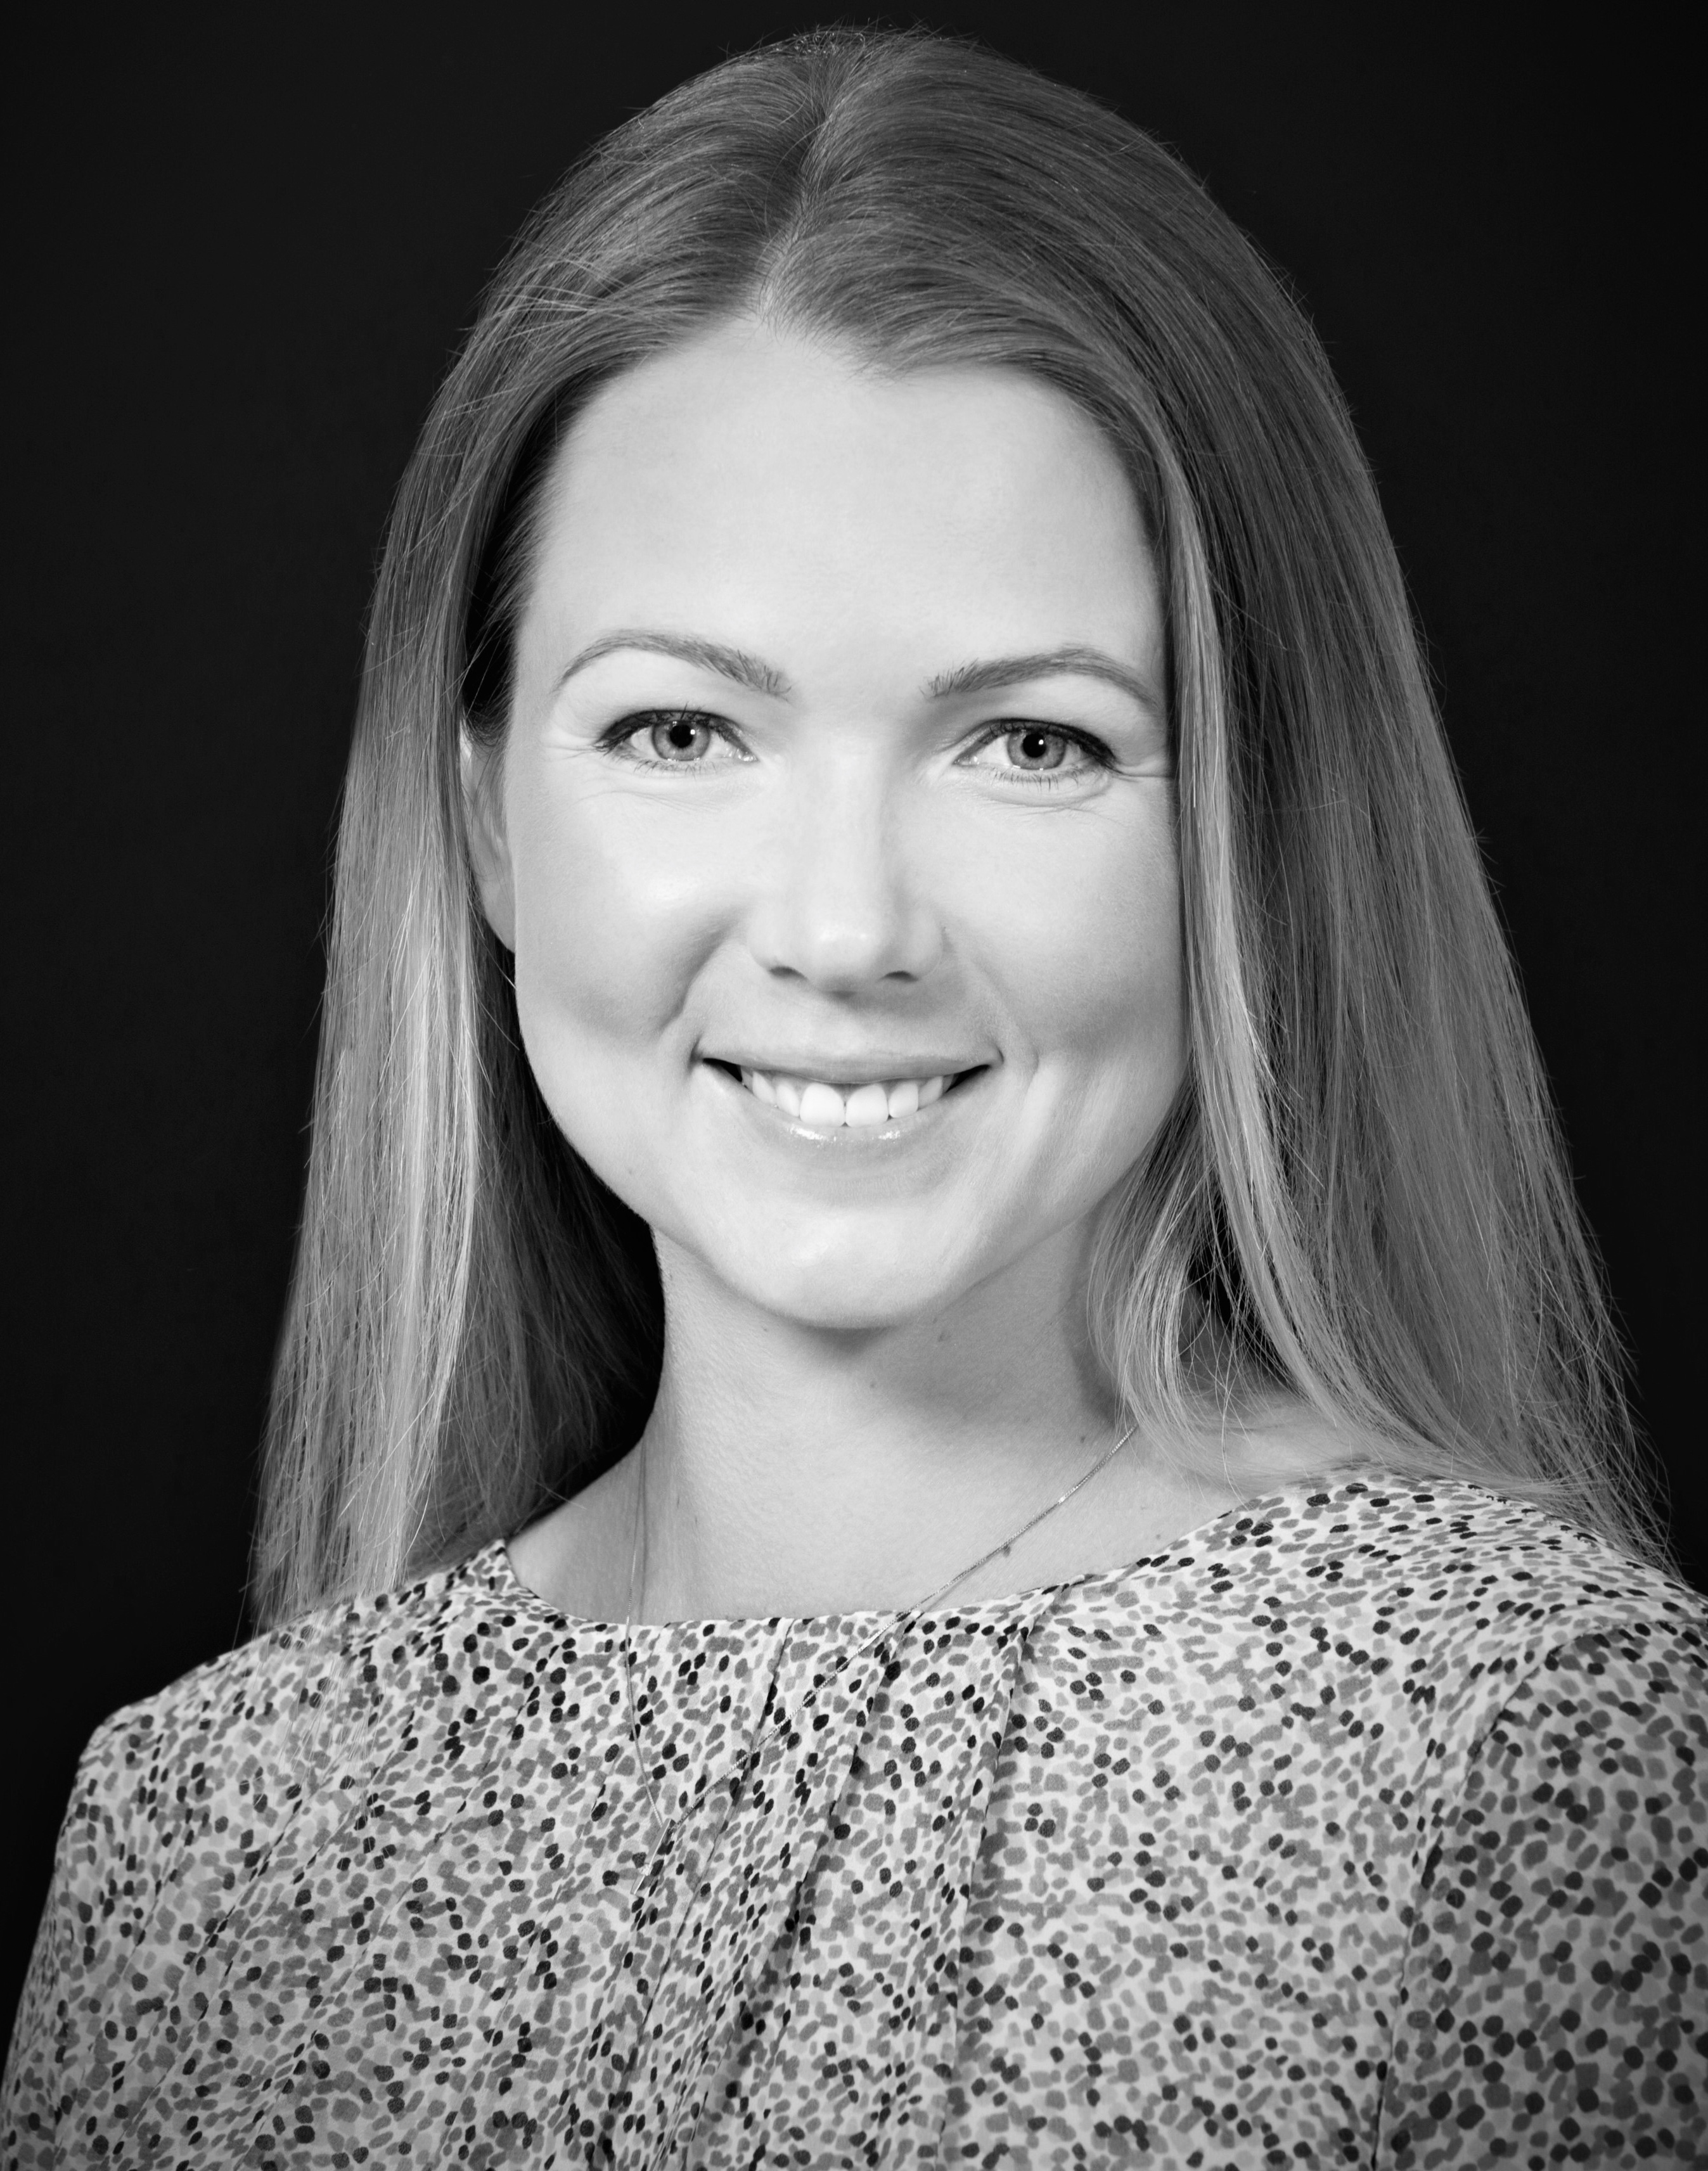 Tatiana Soldatova